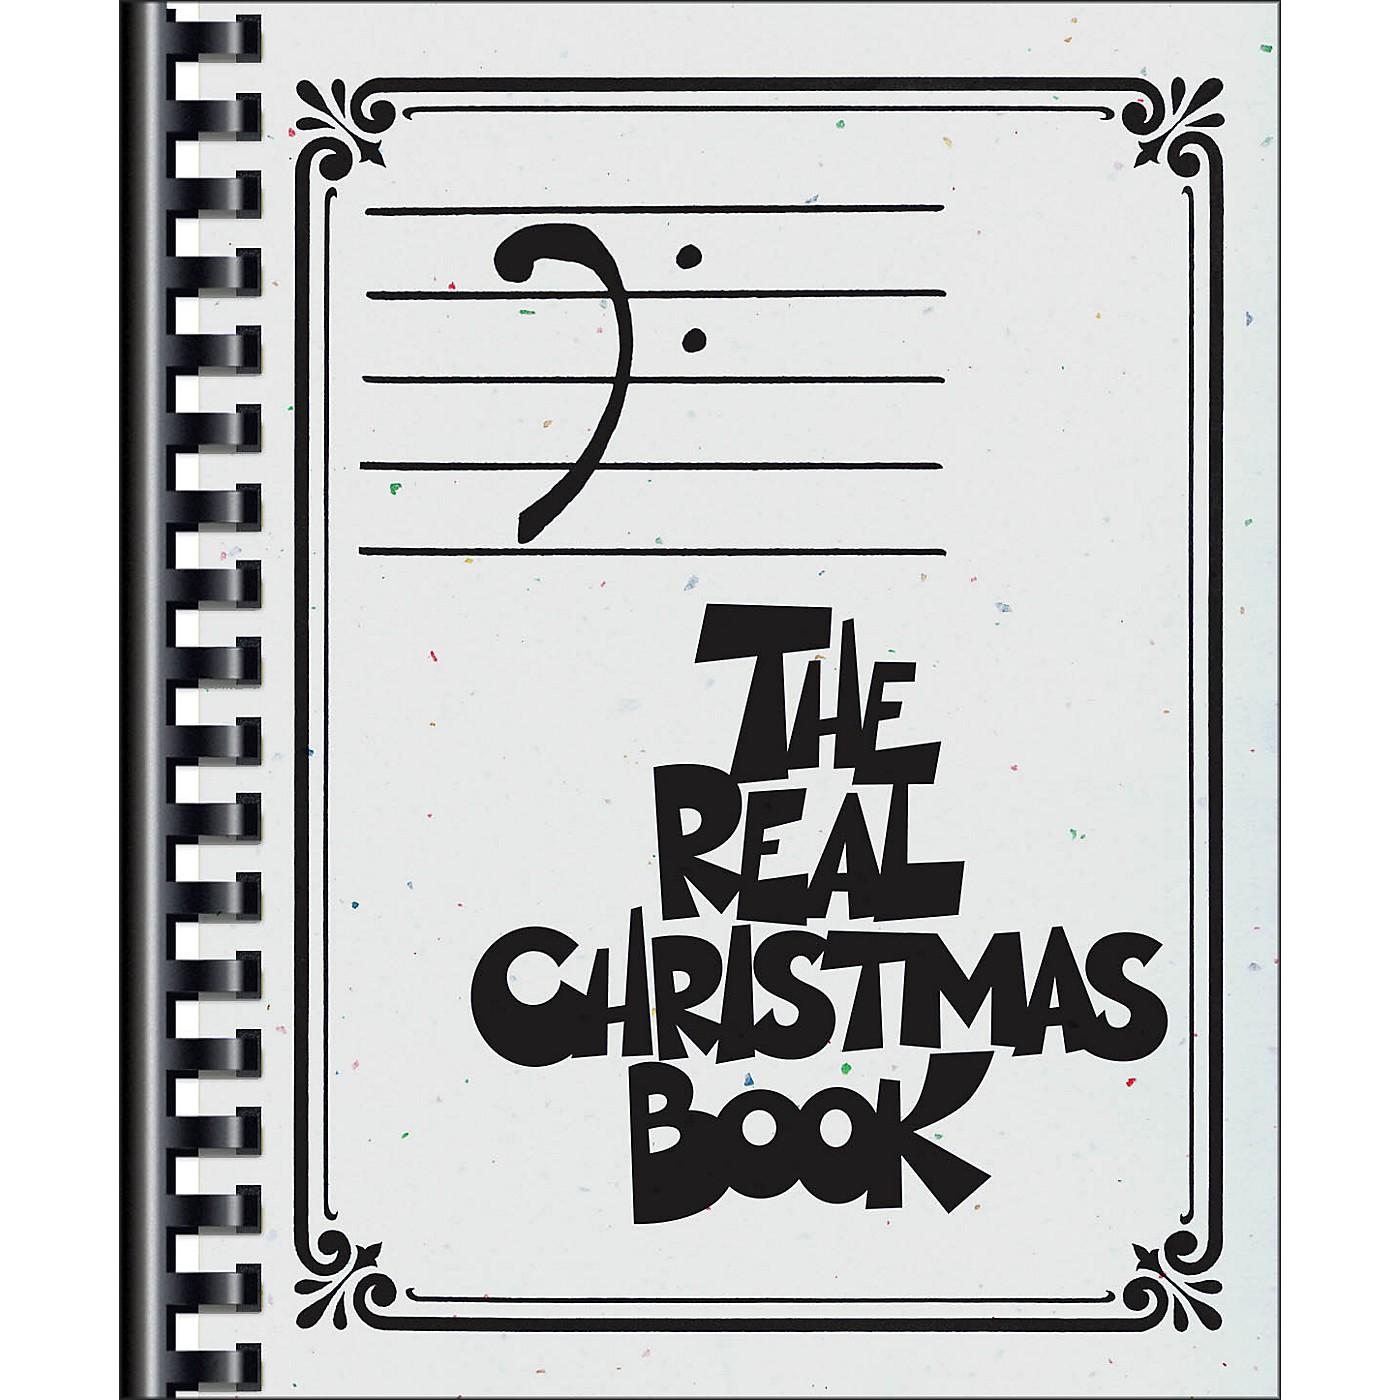 Hal Leonard The Real Christmas Book - Bass Clef Edition thumbnail